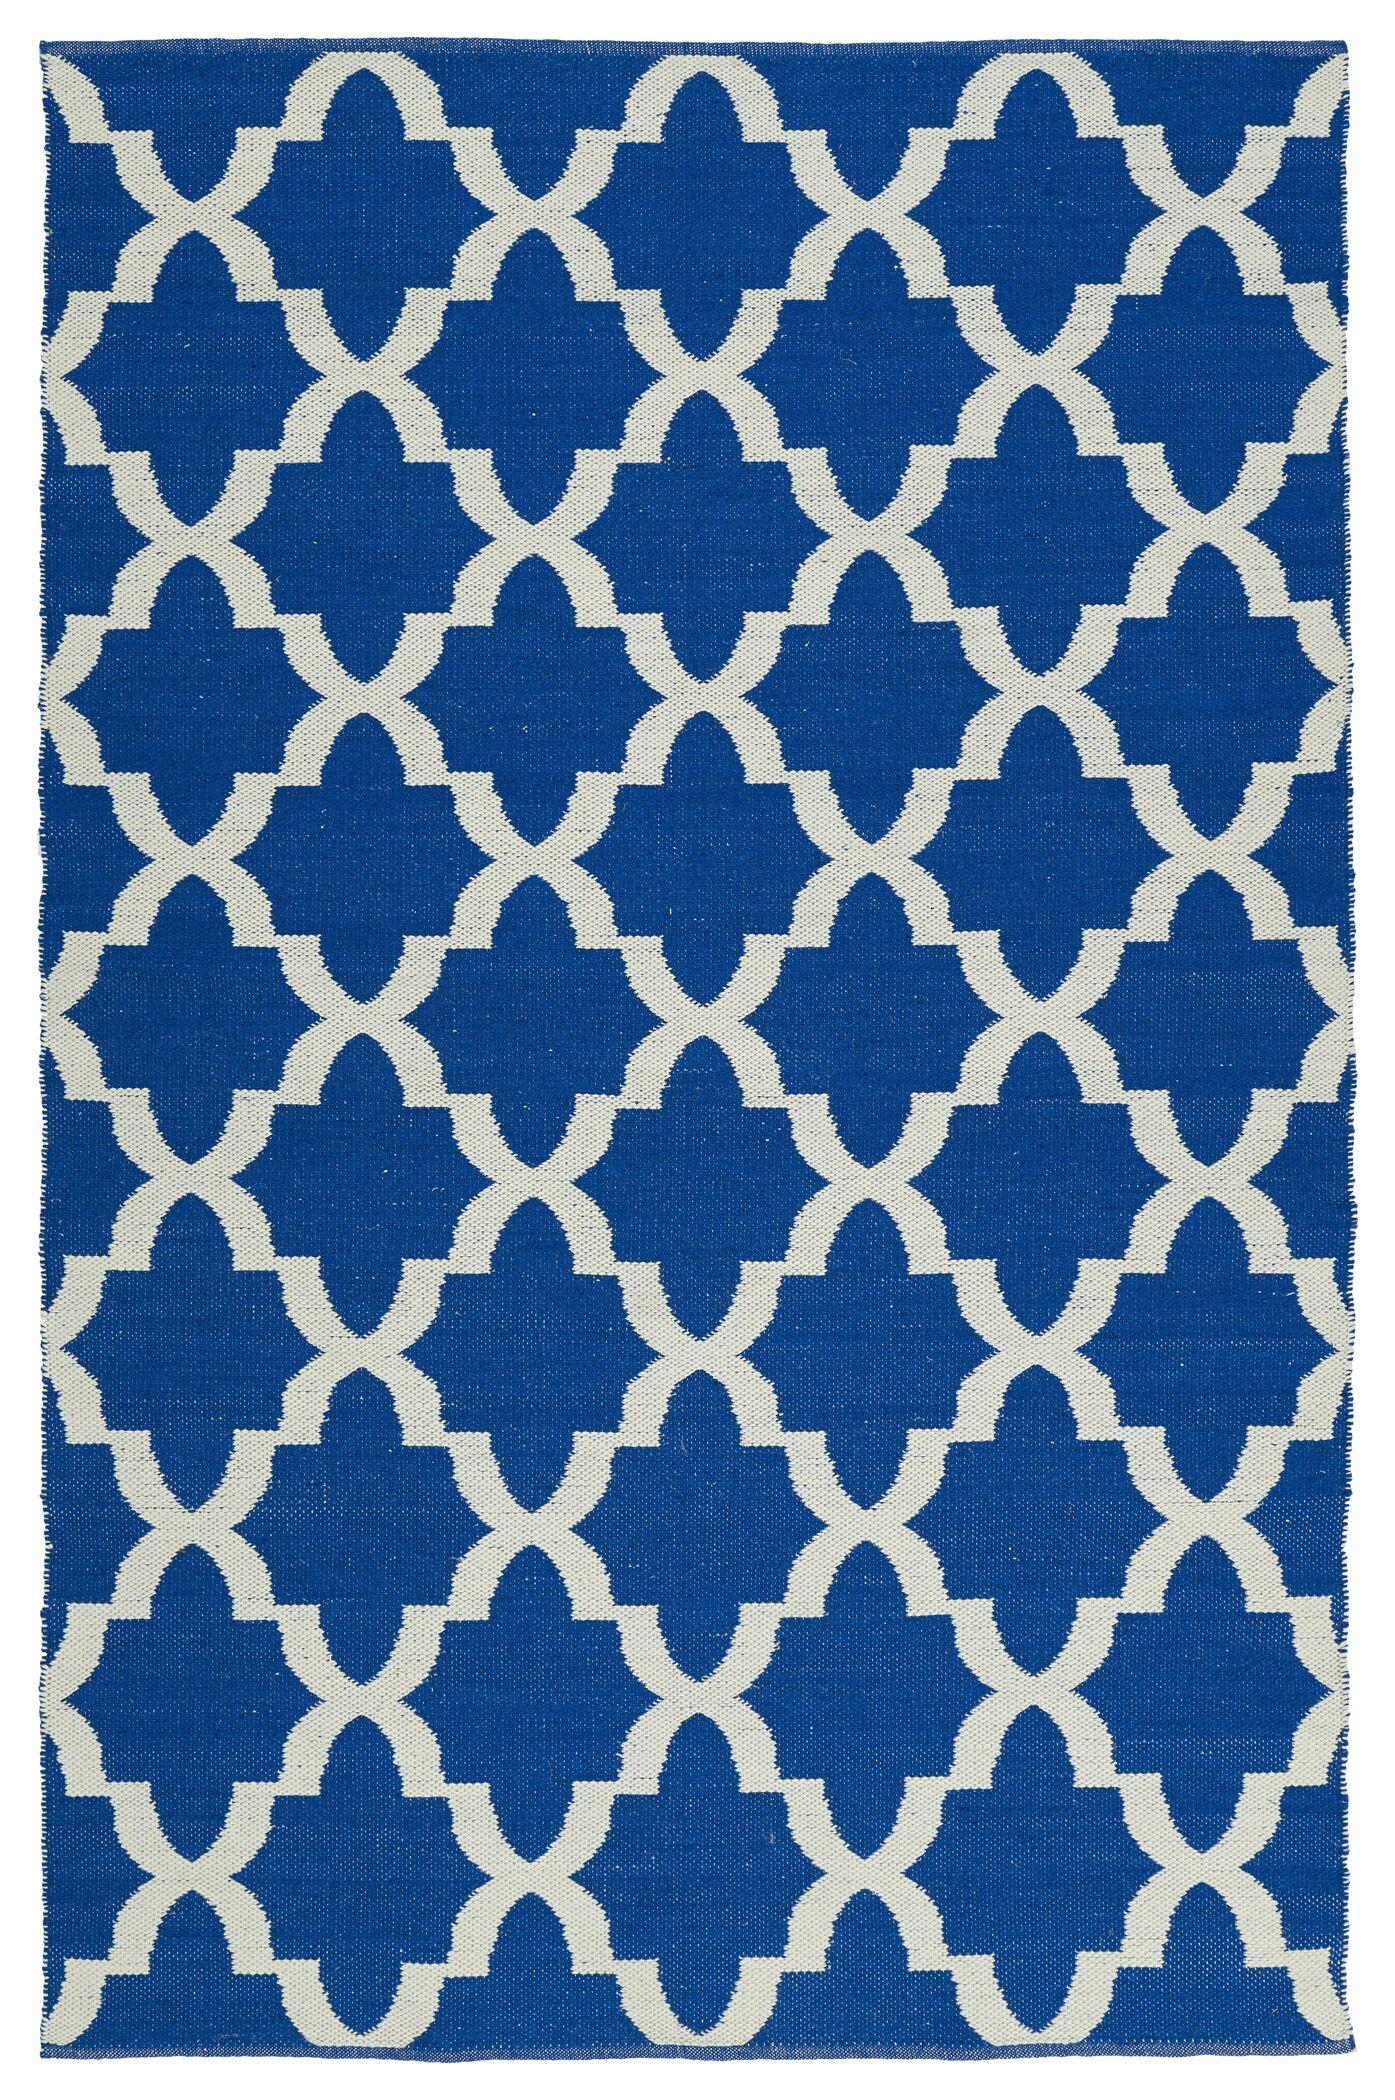 Tyesha Navy/Cream Indoor/Outdoor Area Rug Rug Size: Rectangle 9' x 12'